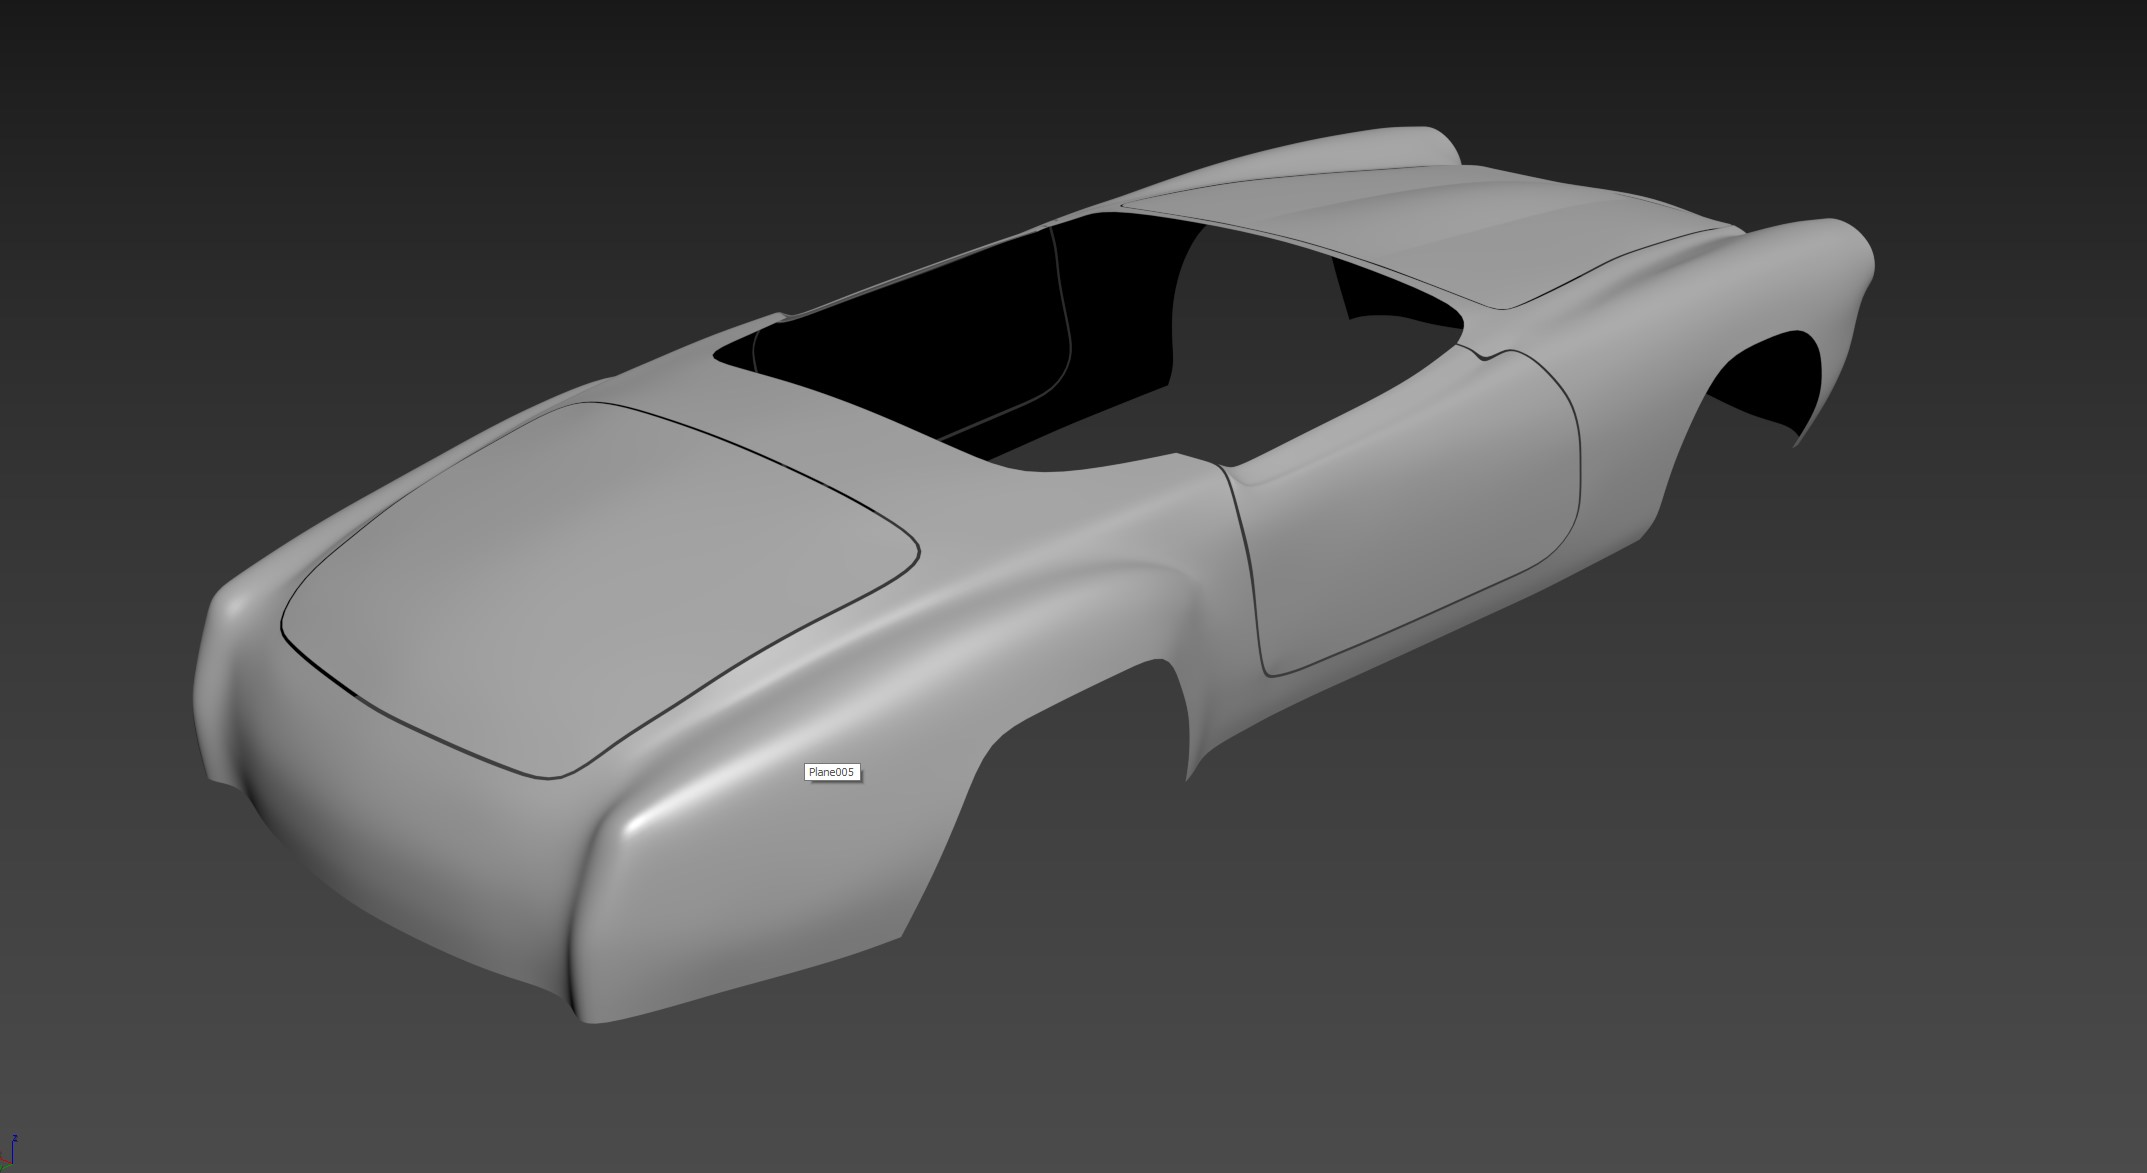 Car Render Challenge 2020 - 190SL